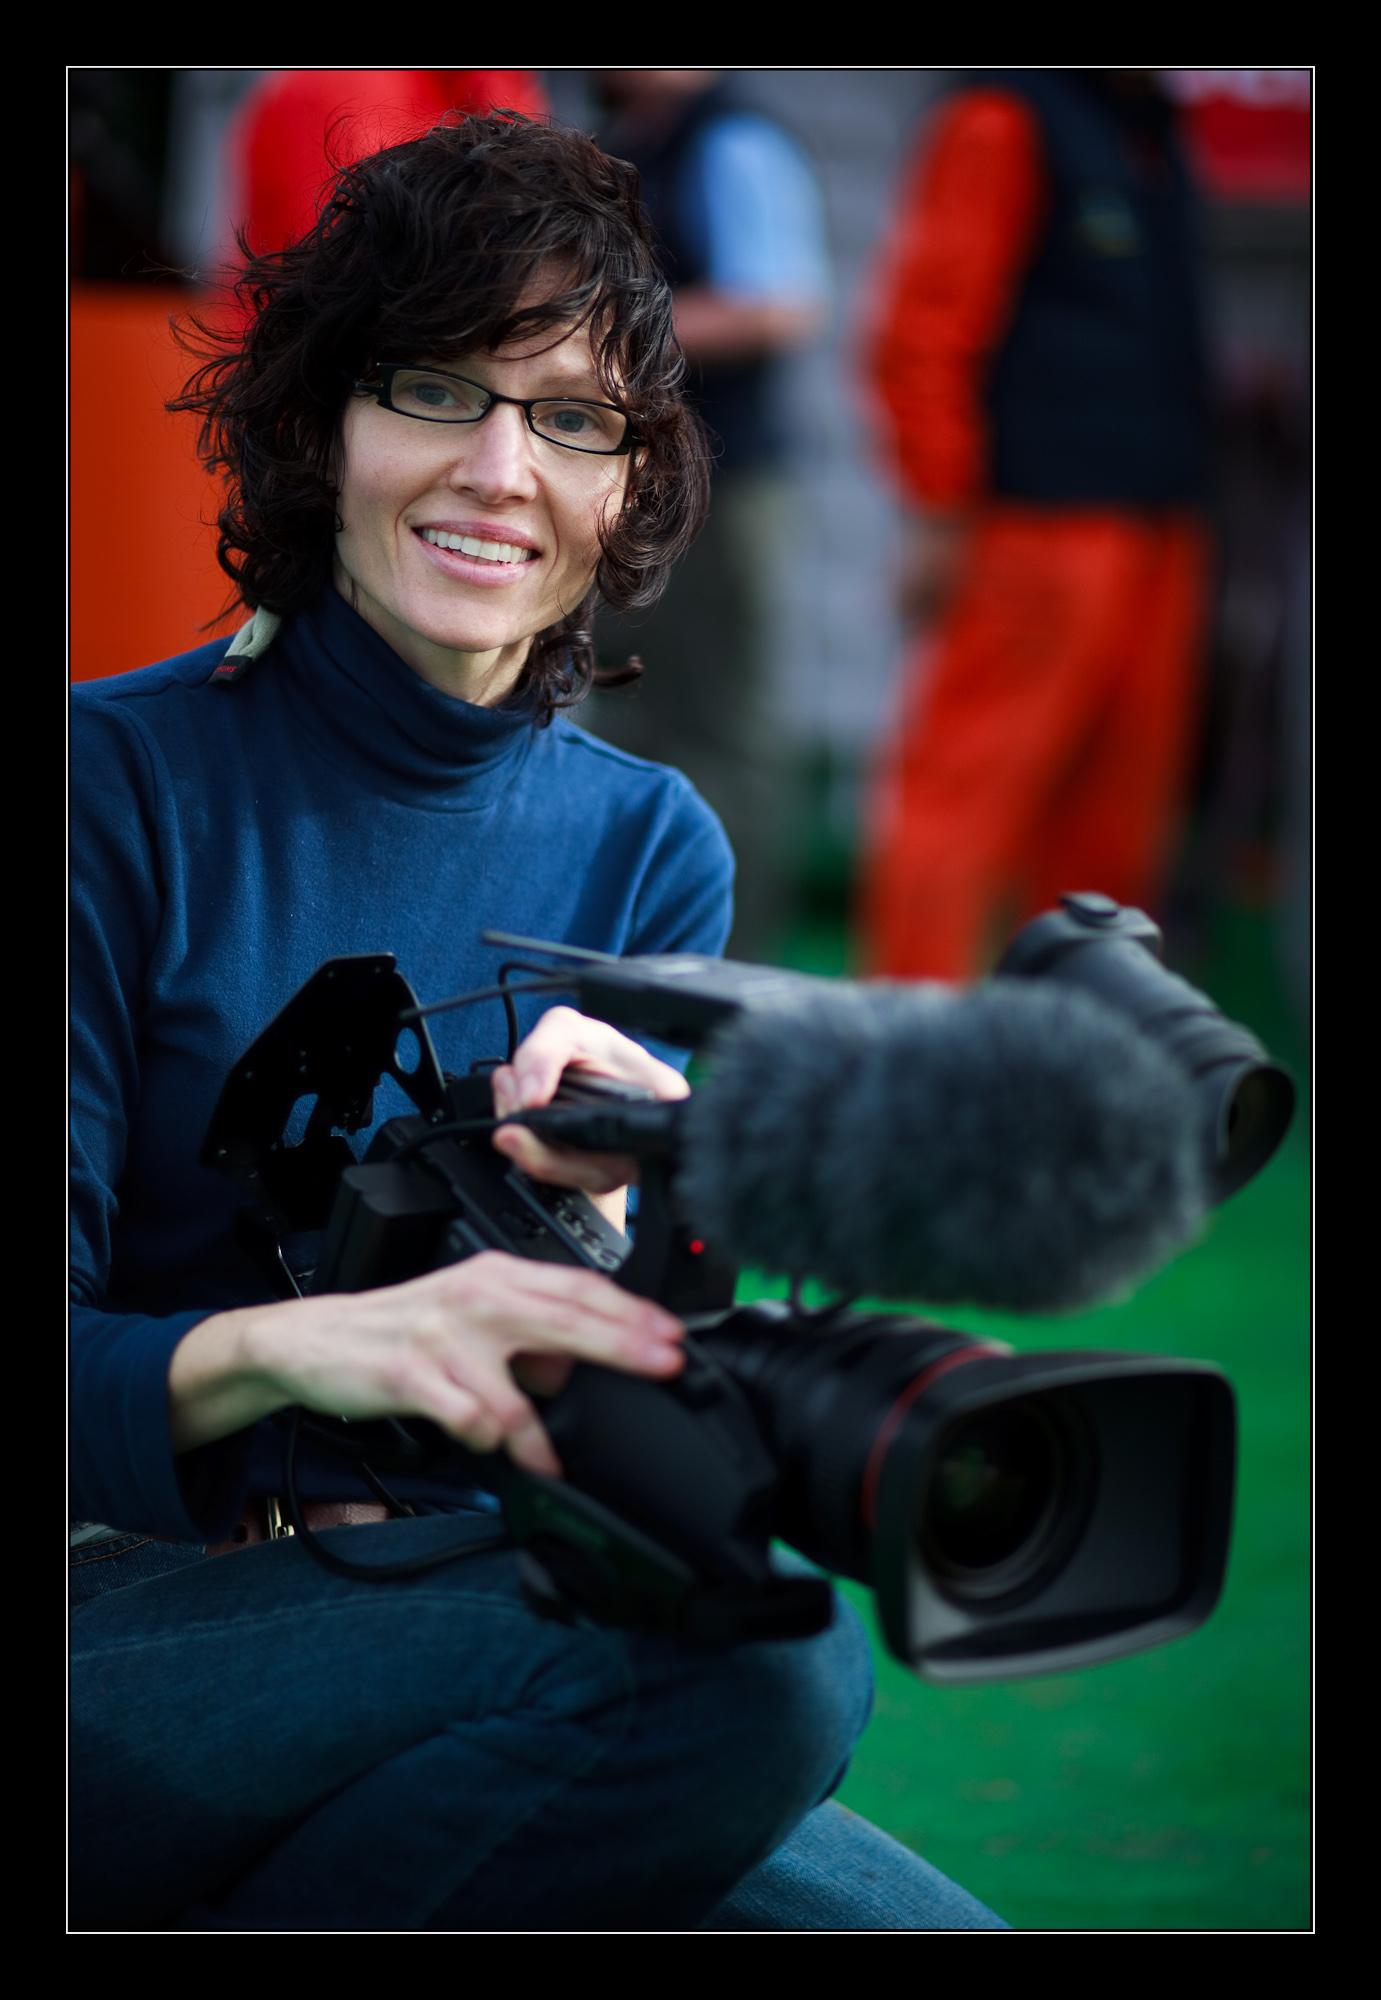 Dena Seidel, director of Rutgers Center for Digital Filmmaking